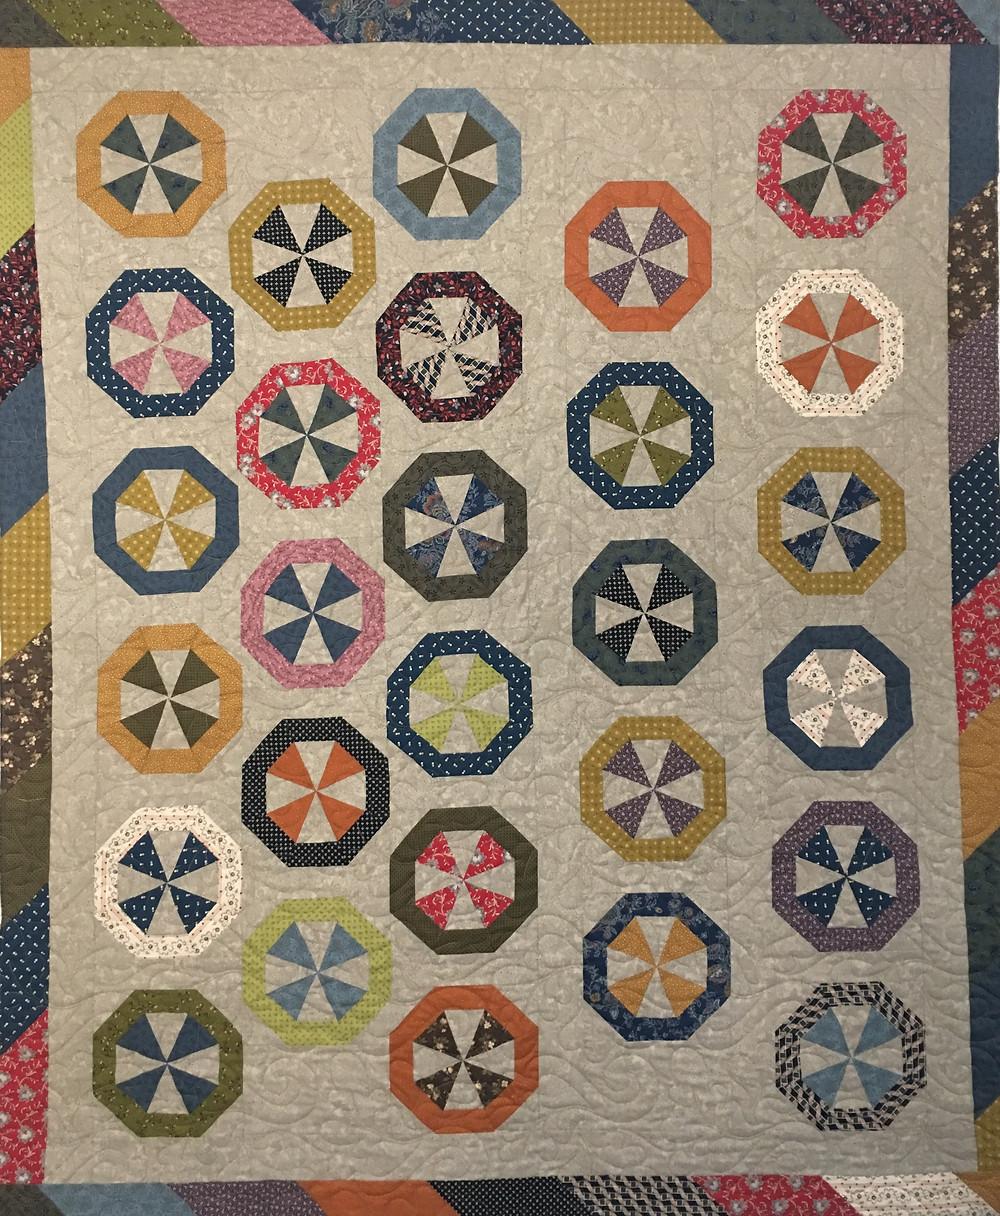 Scrappy Pinwheel Hedgehog Block Quilt by Jill Seward